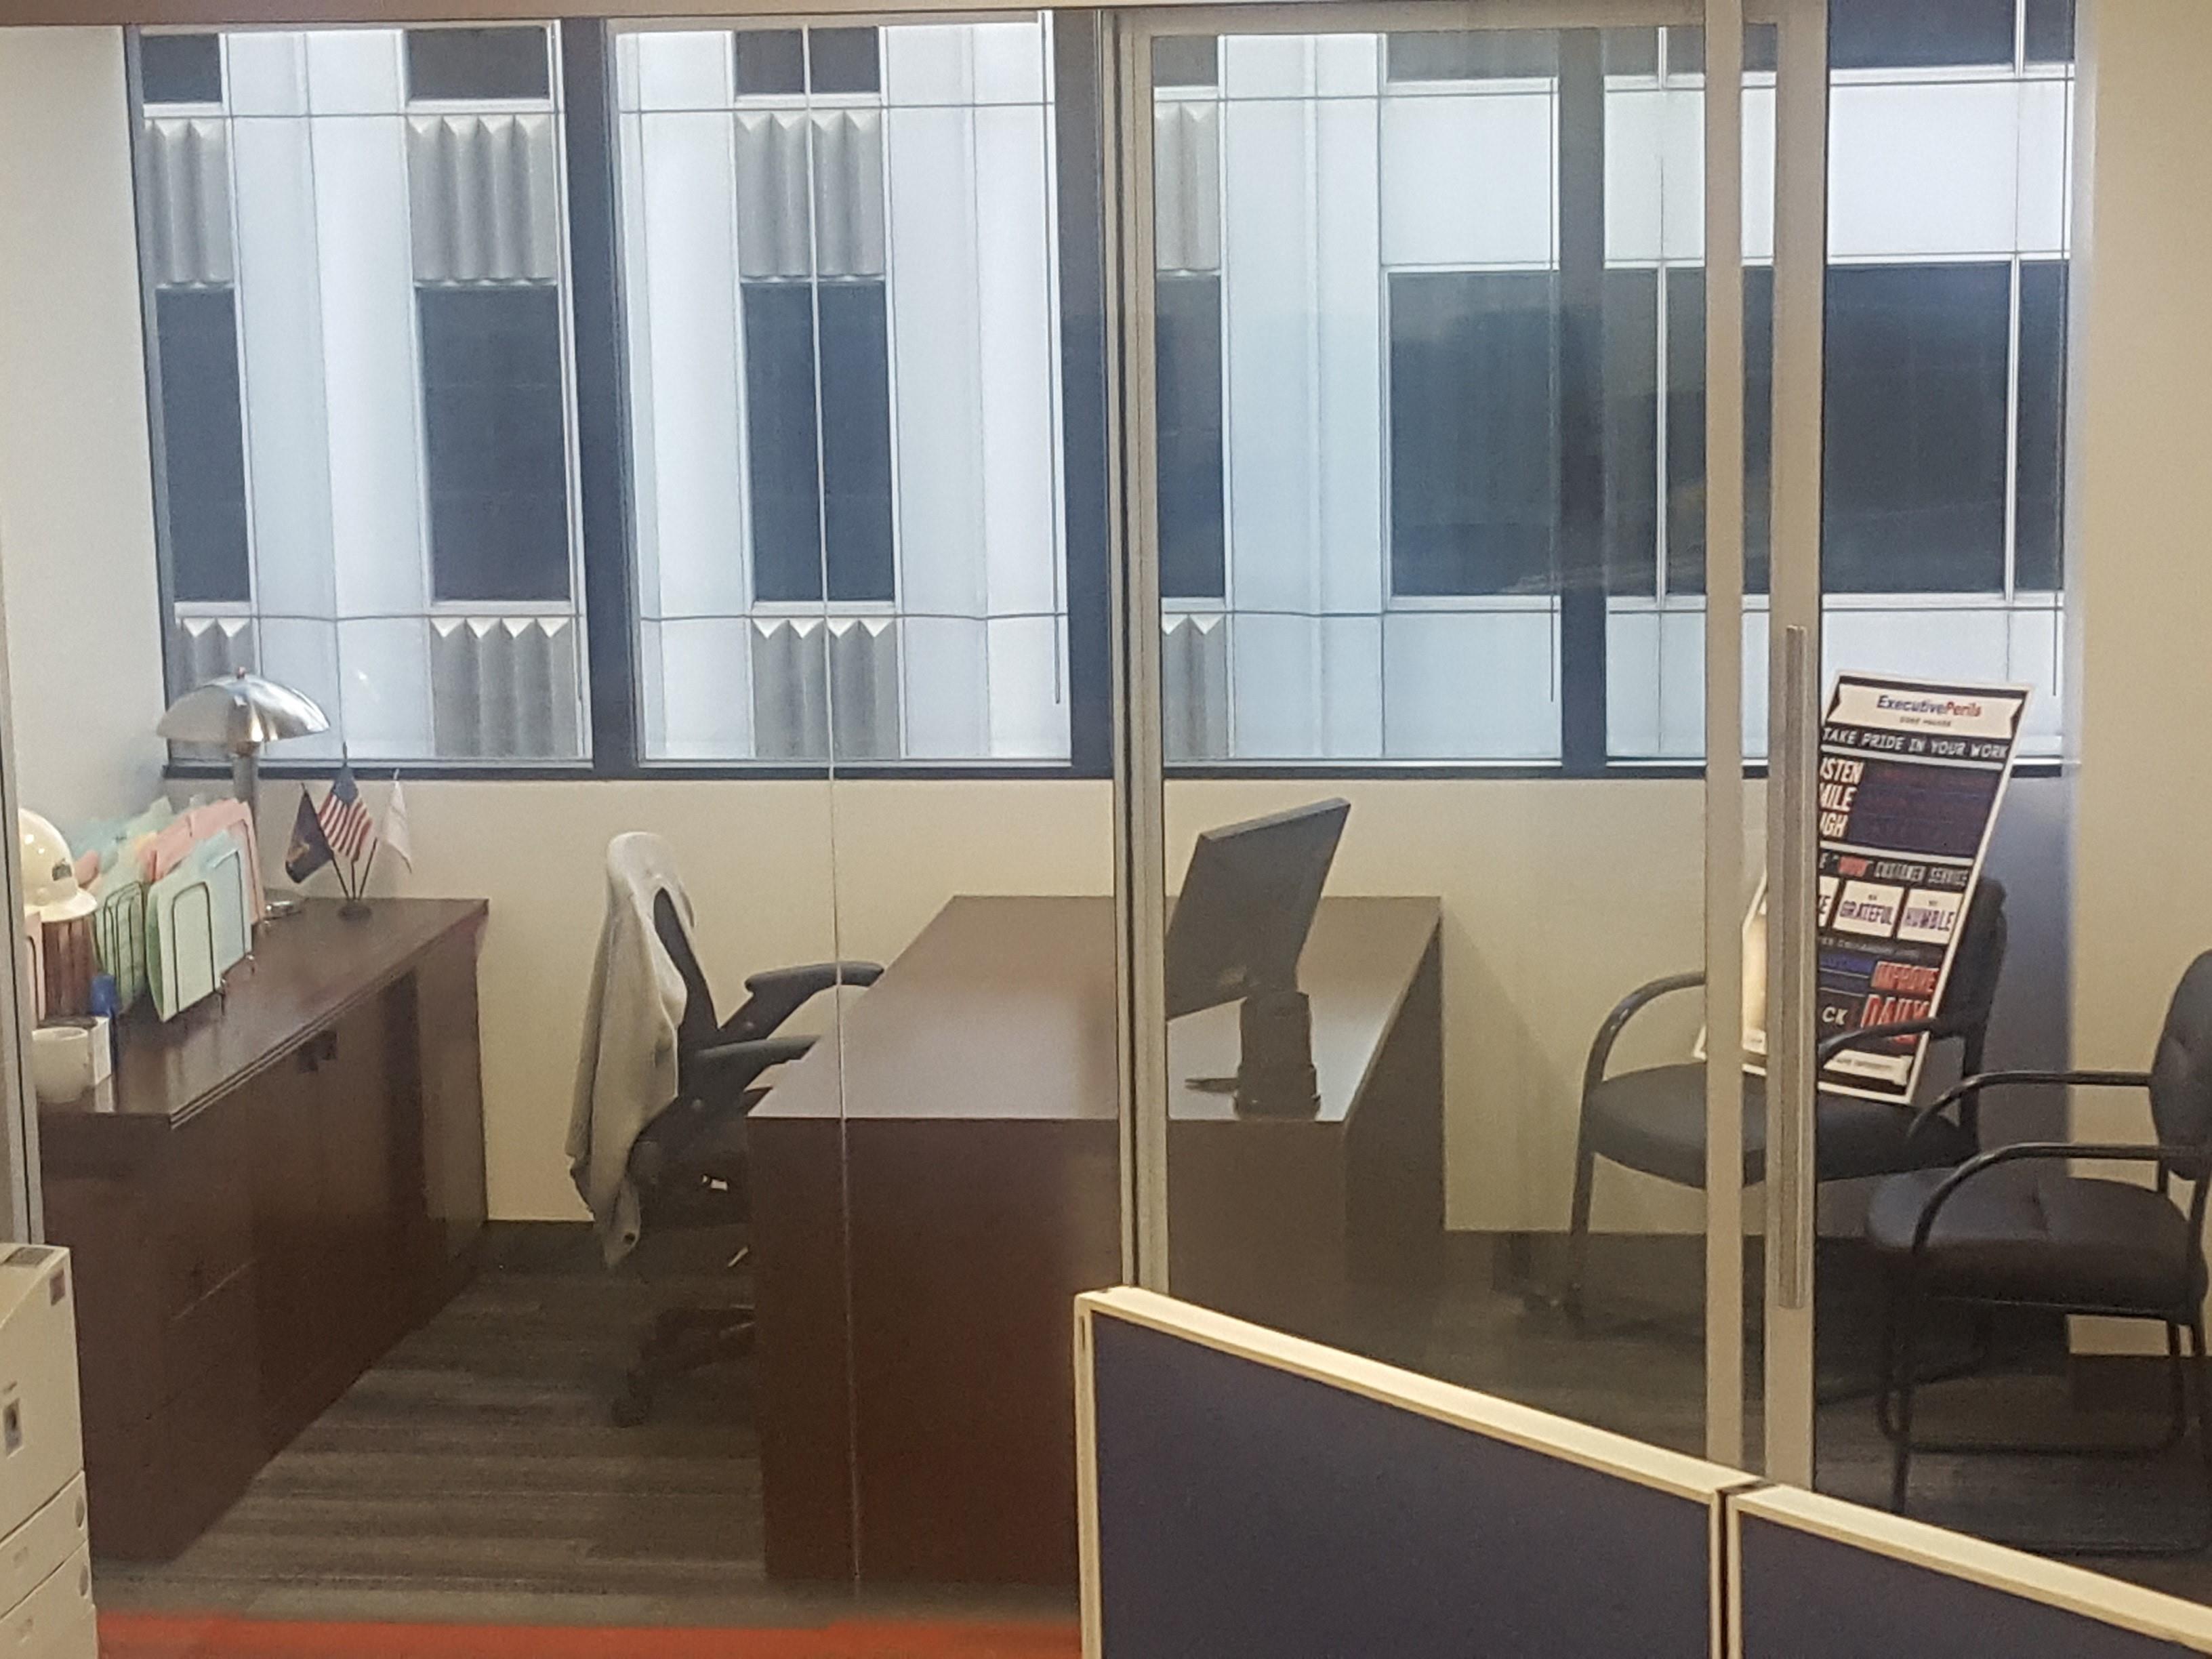 Executive Perils, Inc. - Office 1